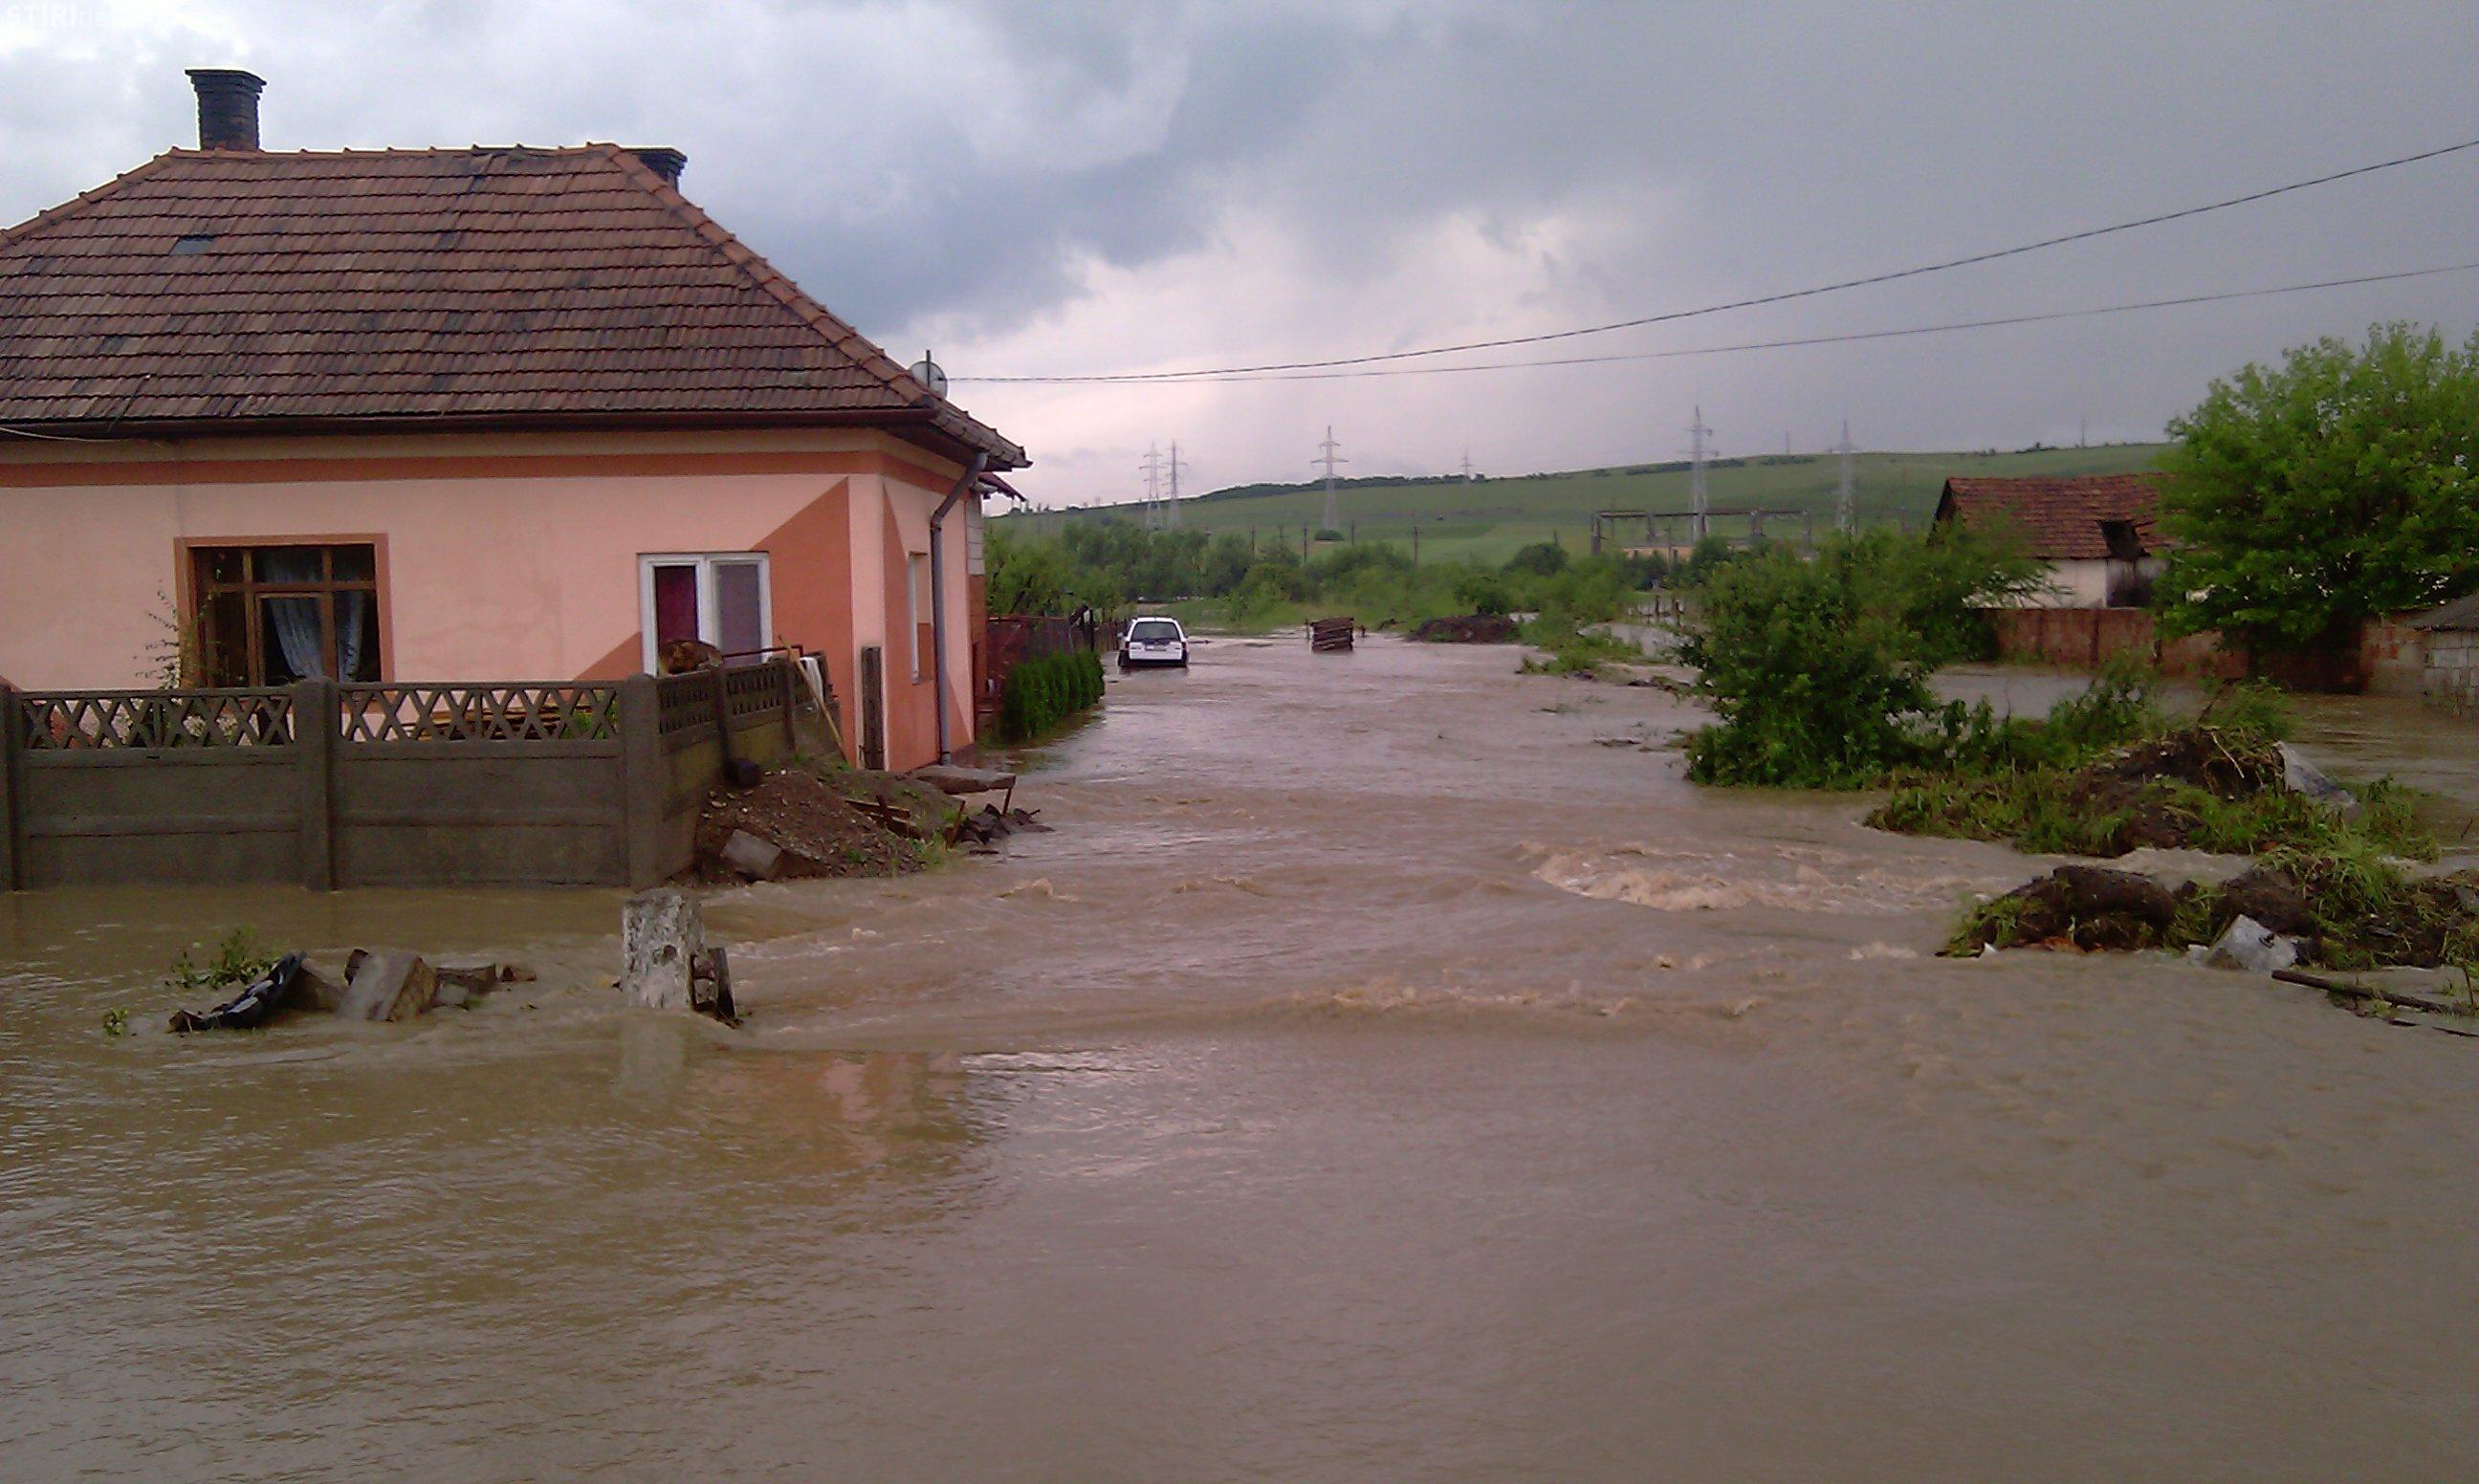 Cod galben de inundatii la Cluj pana luni la ora 24.00. Alte 14 judete din tara sunt sub cod portocaliu de inundatii